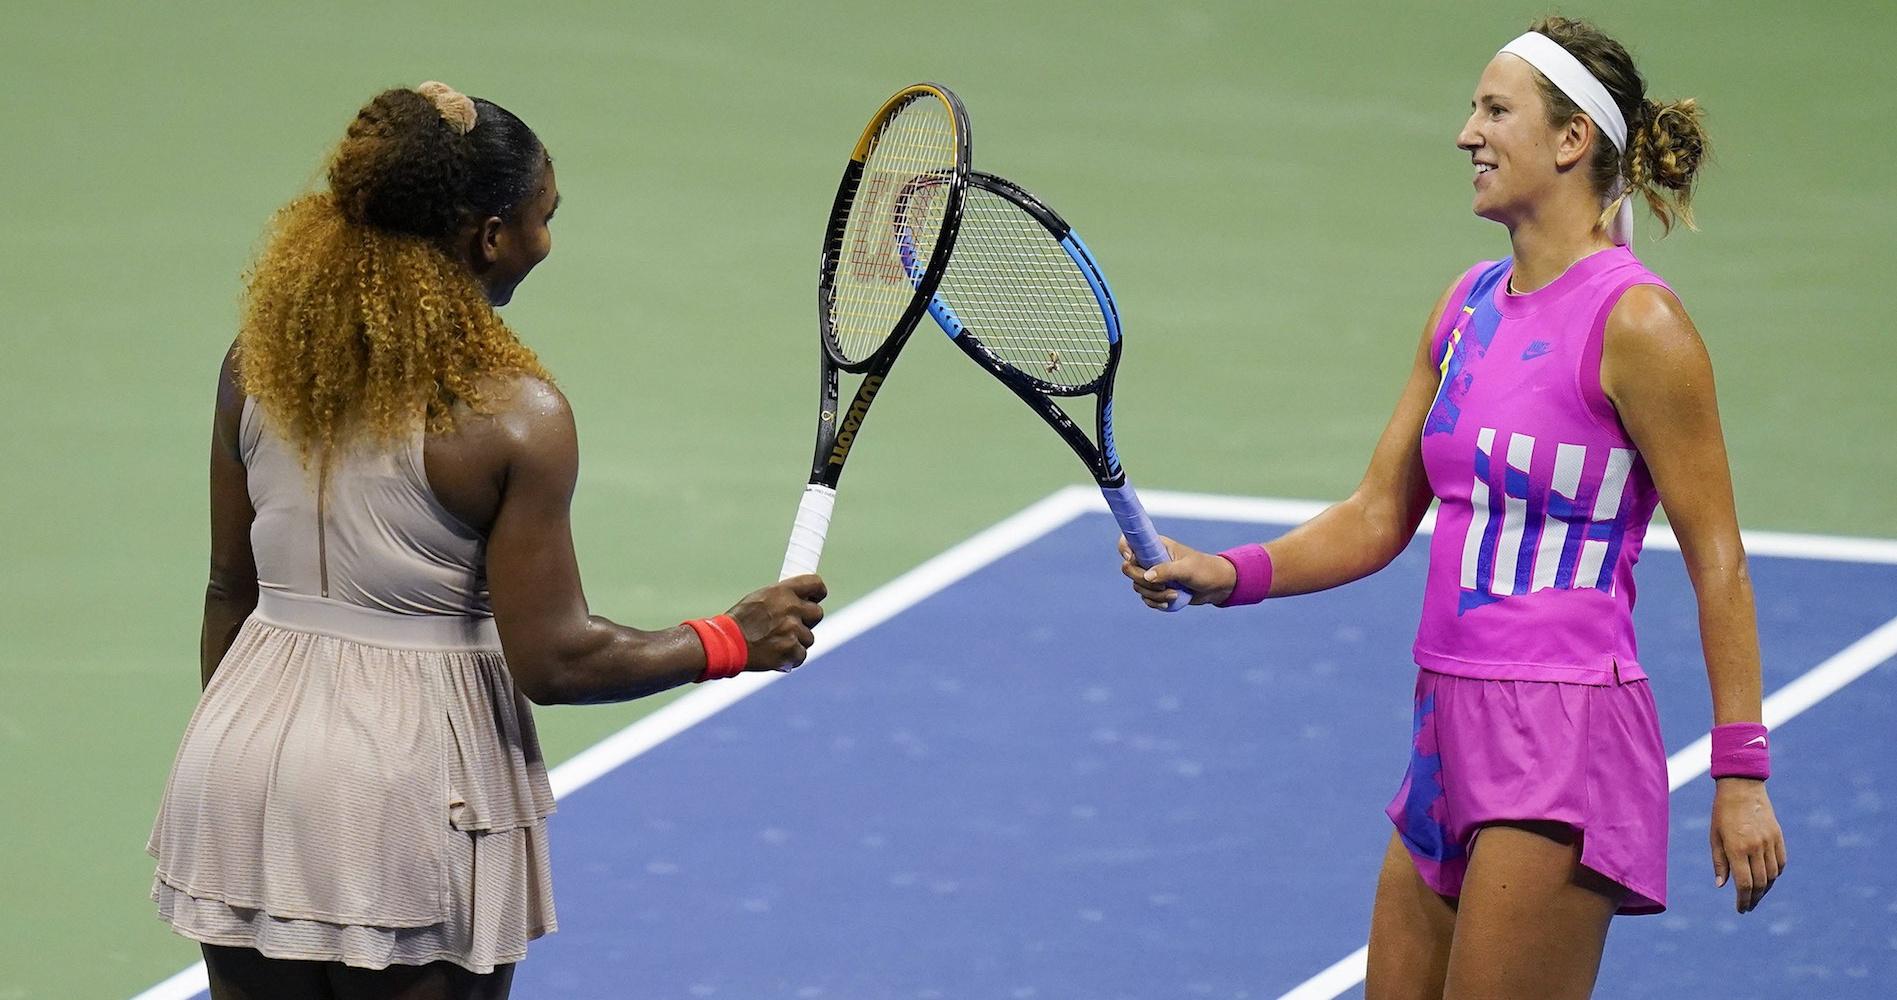 Serena Williams and Victoria Azarenka, US Open semi-final, september 2020